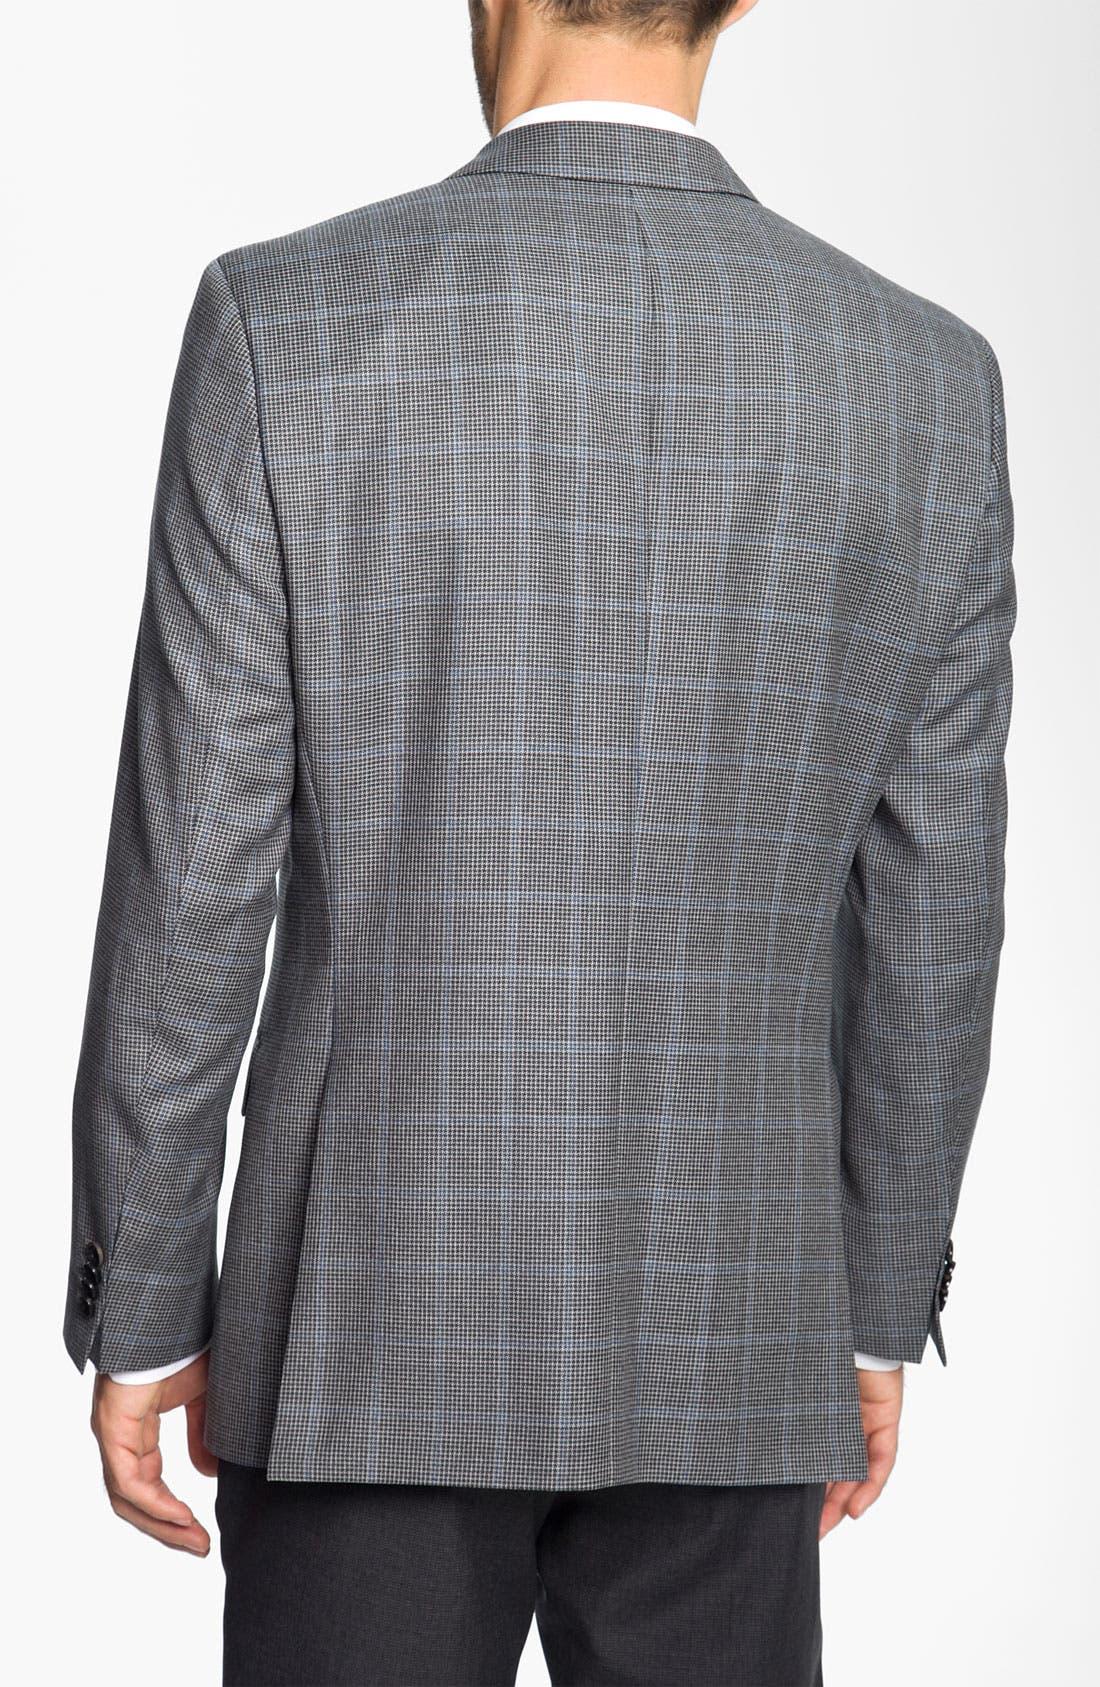 Alternate Image 2  - BOSS Black 'Pasini' Houndstooth Sportcoat